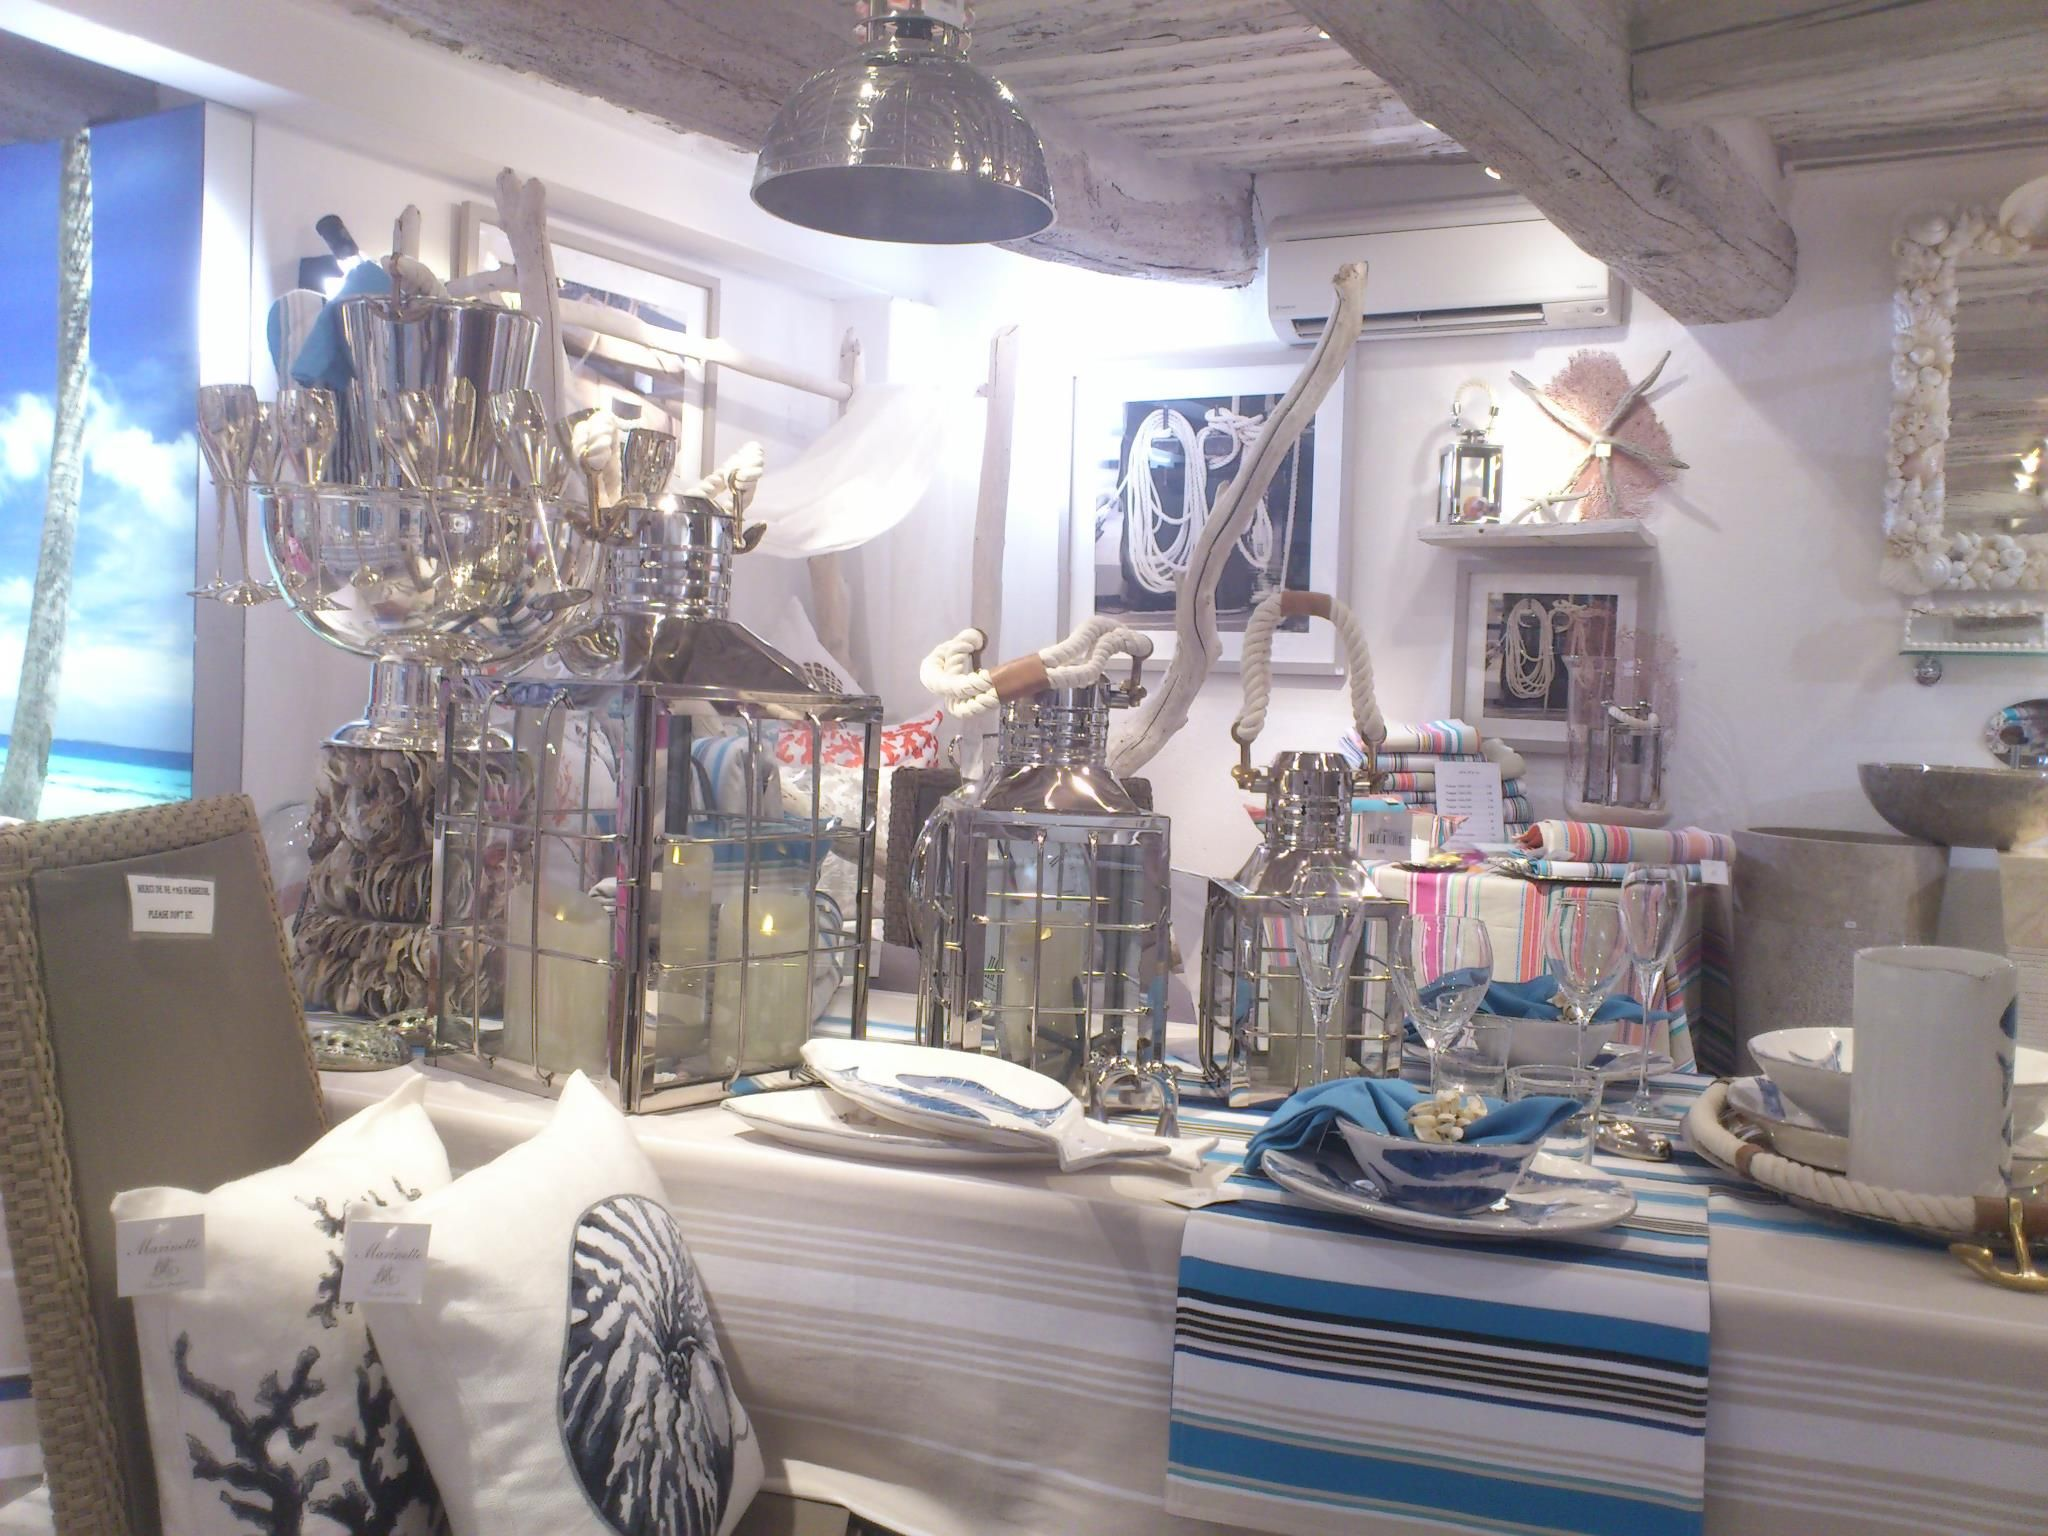 tissus marinette saint tropez desideri table. Black Bedroom Furniture Sets. Home Design Ideas